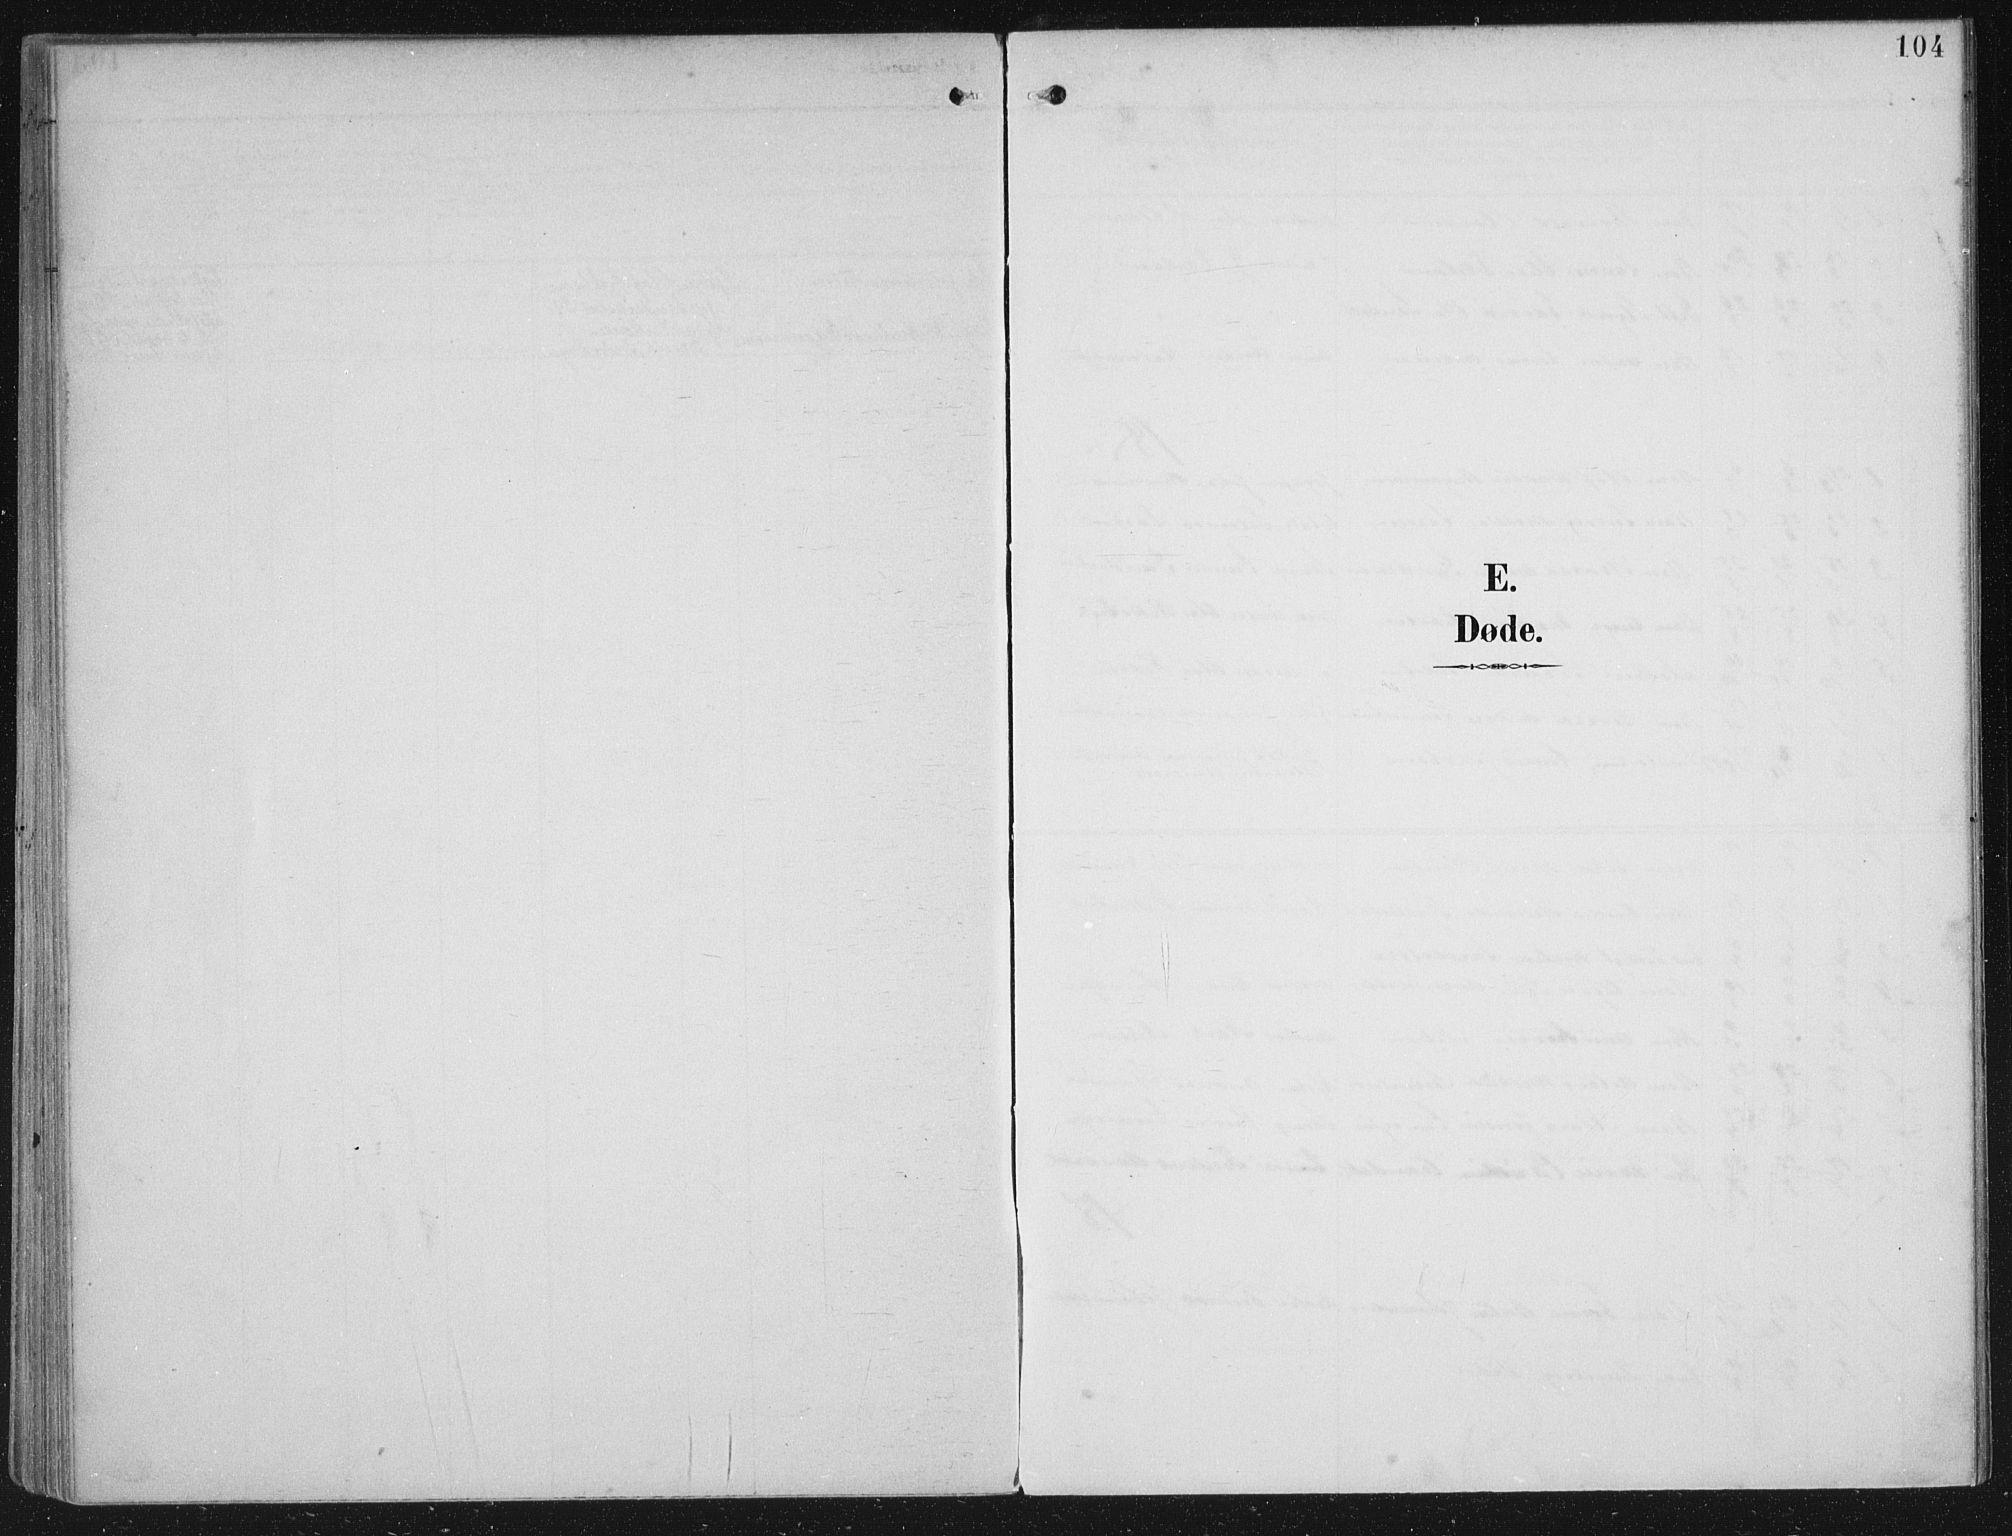 SAB, Kinn sokneprestembete, H/Haa/Haac/L0002: Ministerialbok nr. C  2, 1895-1916, s. 104